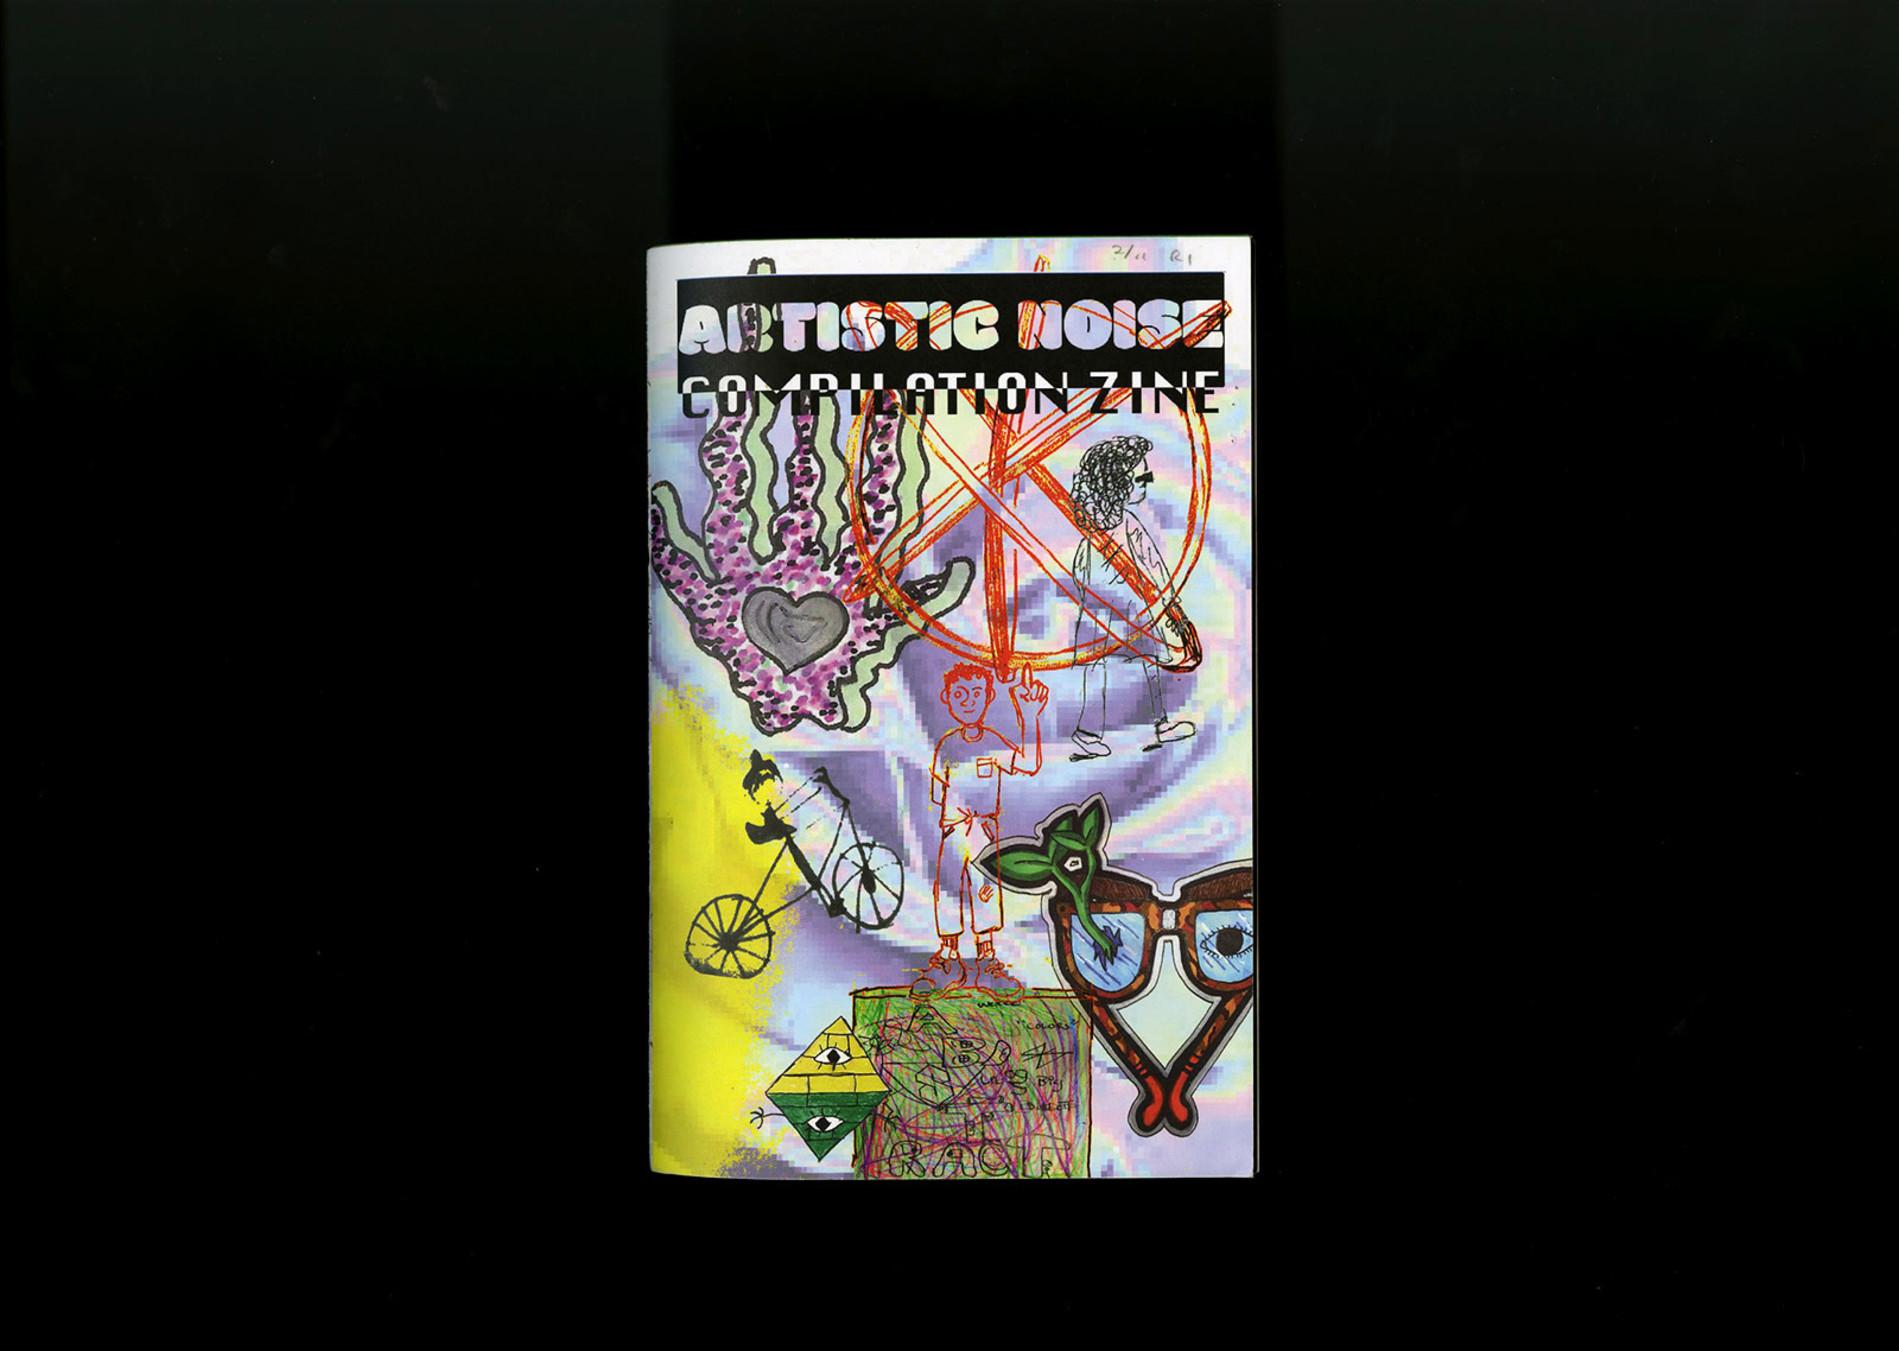 Miriam & Artistic Noise Artistic Noise Compilation Zine